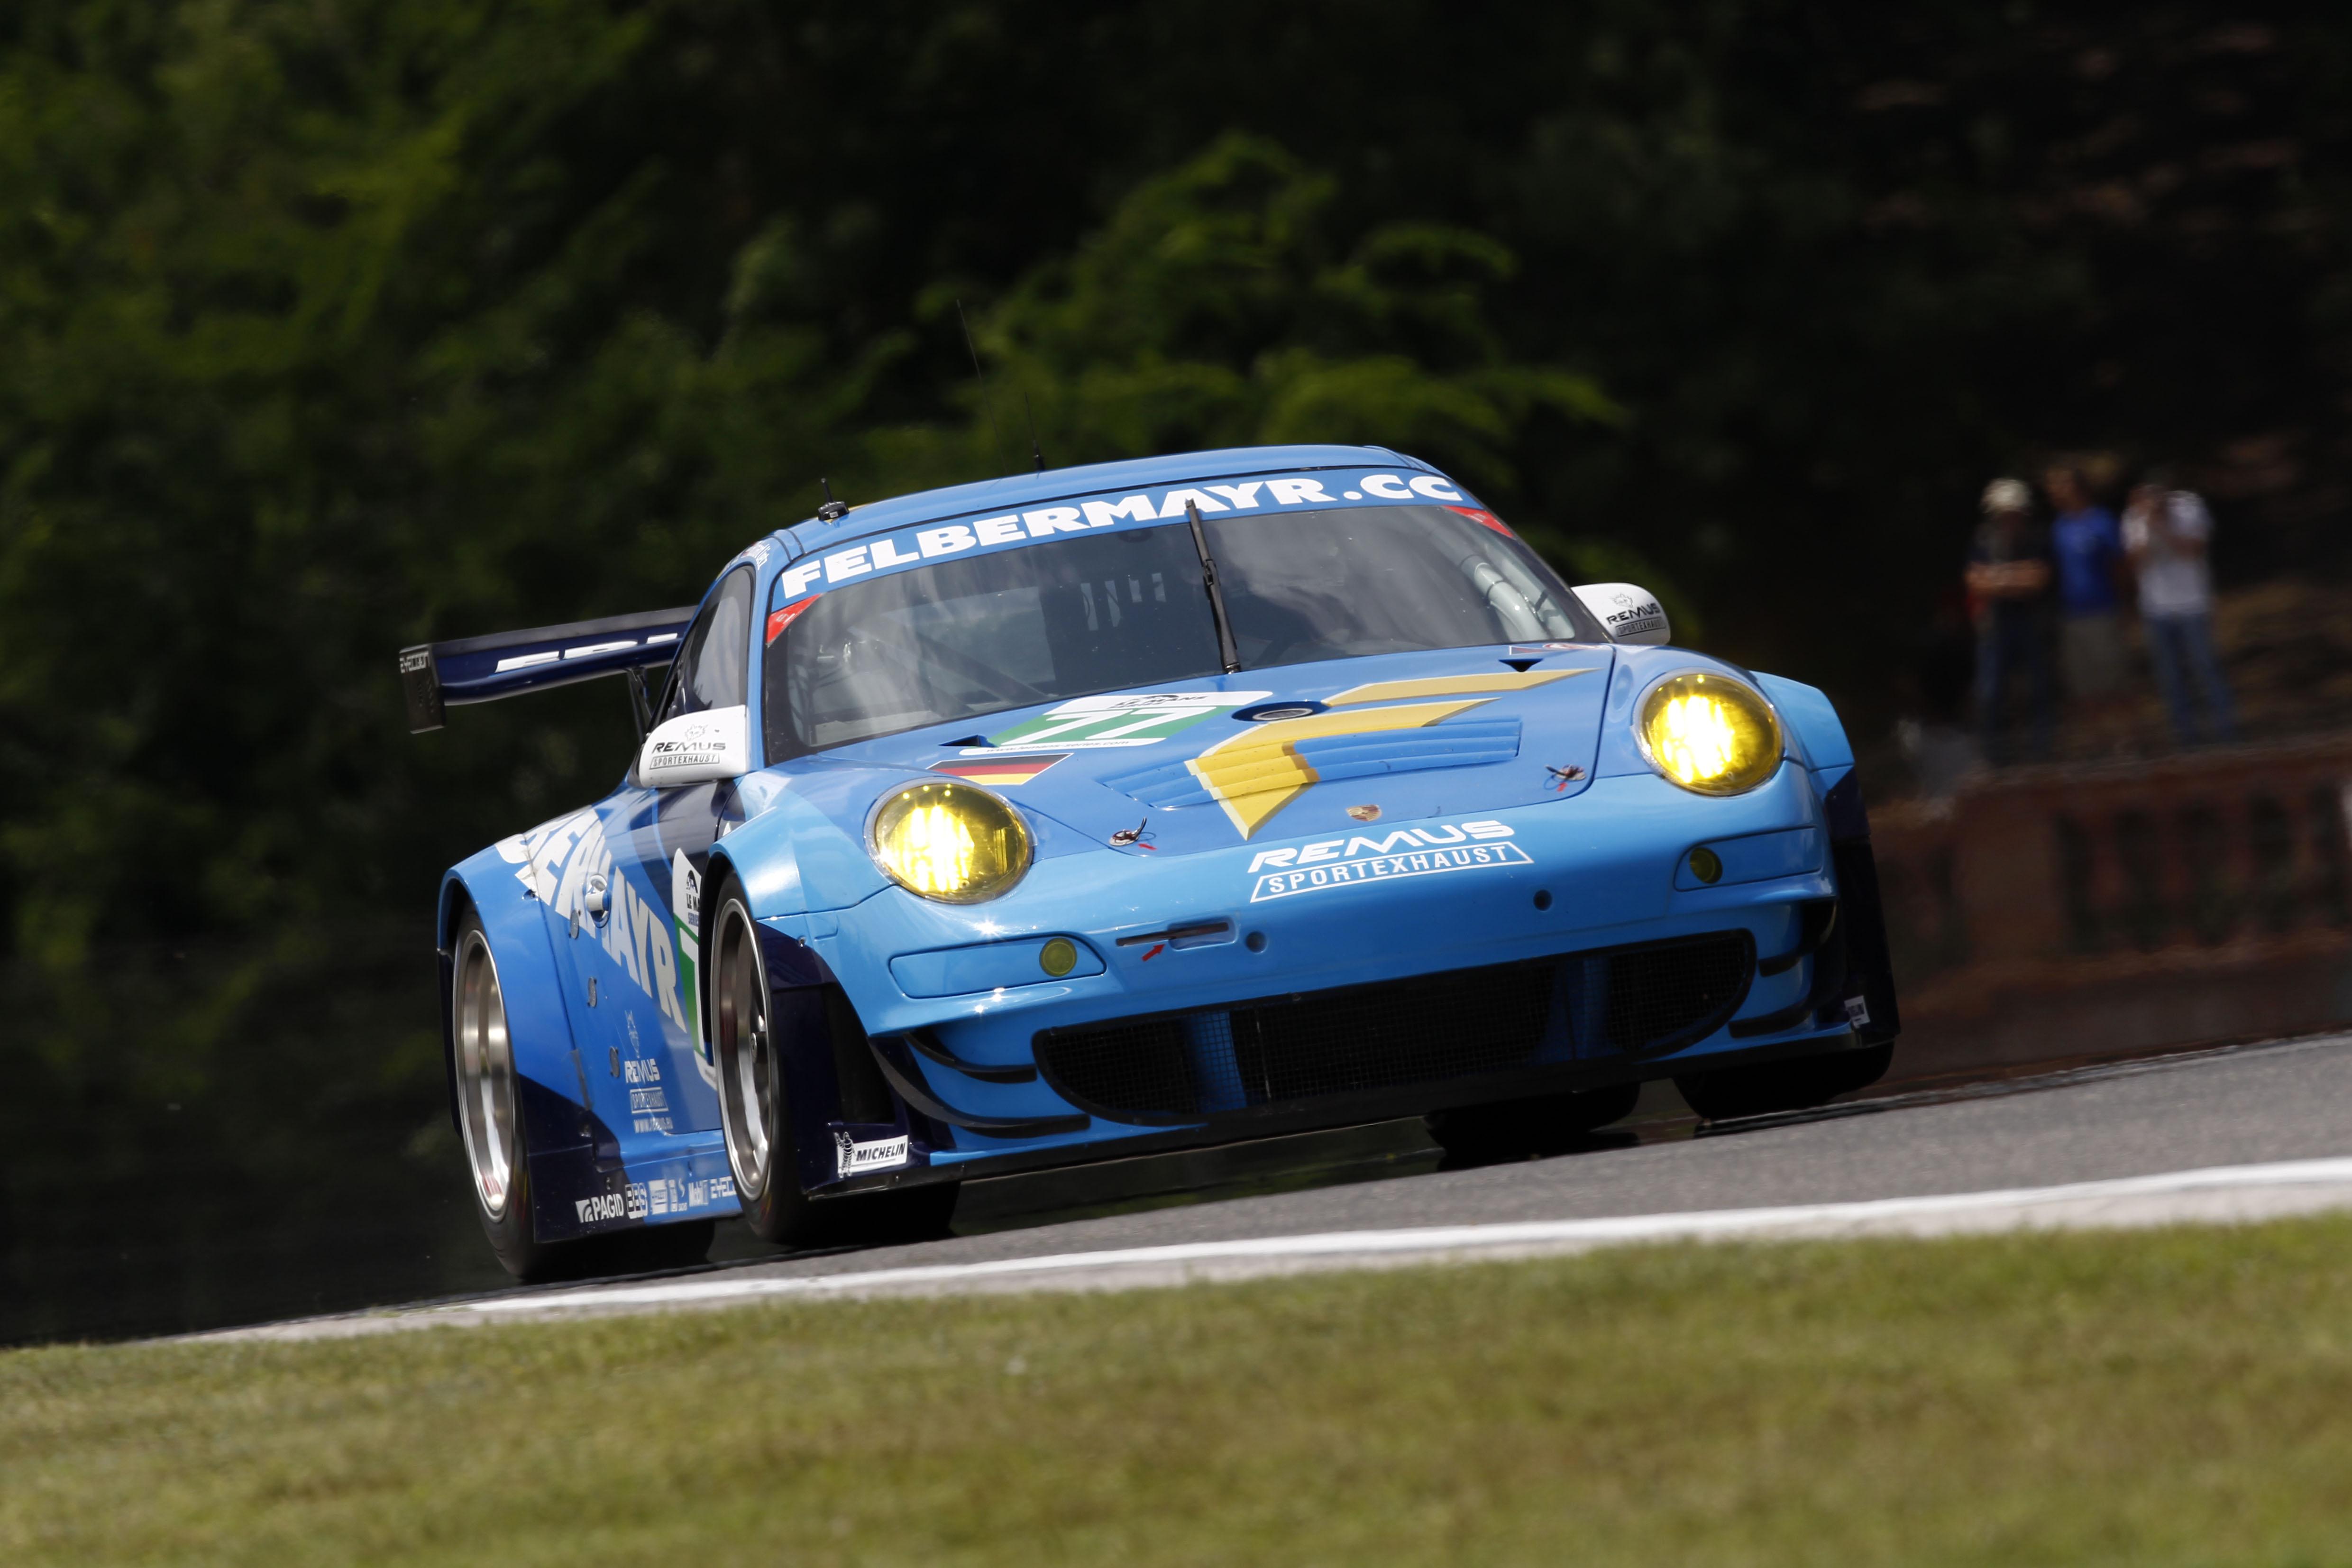 m11_2690_fine1 Wonderful 1998 Porsche 911 Gt1 Specs Cars Trend